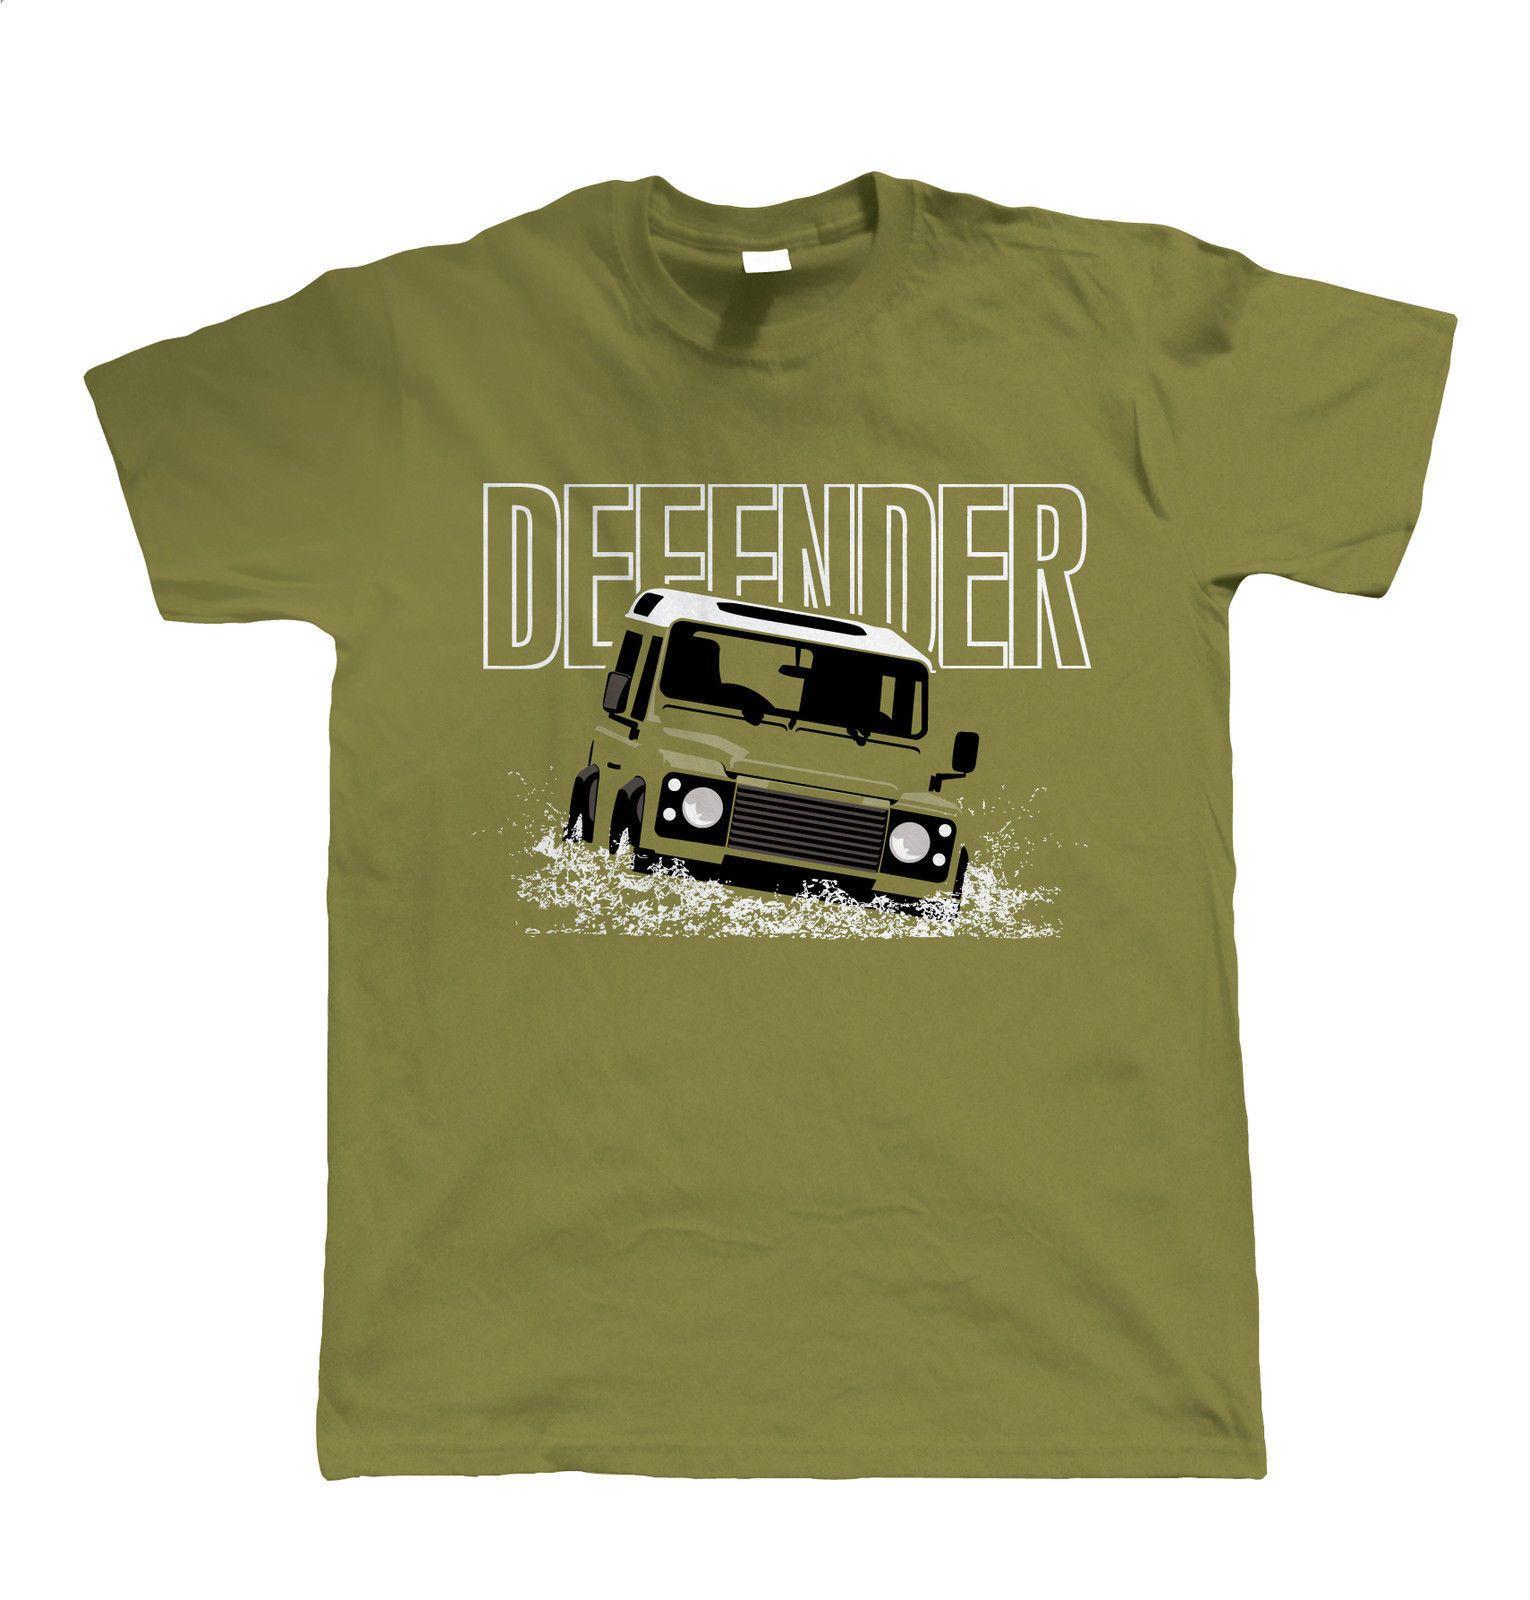 Details about Defender, Mens Off Roading T Shirt, Gift for